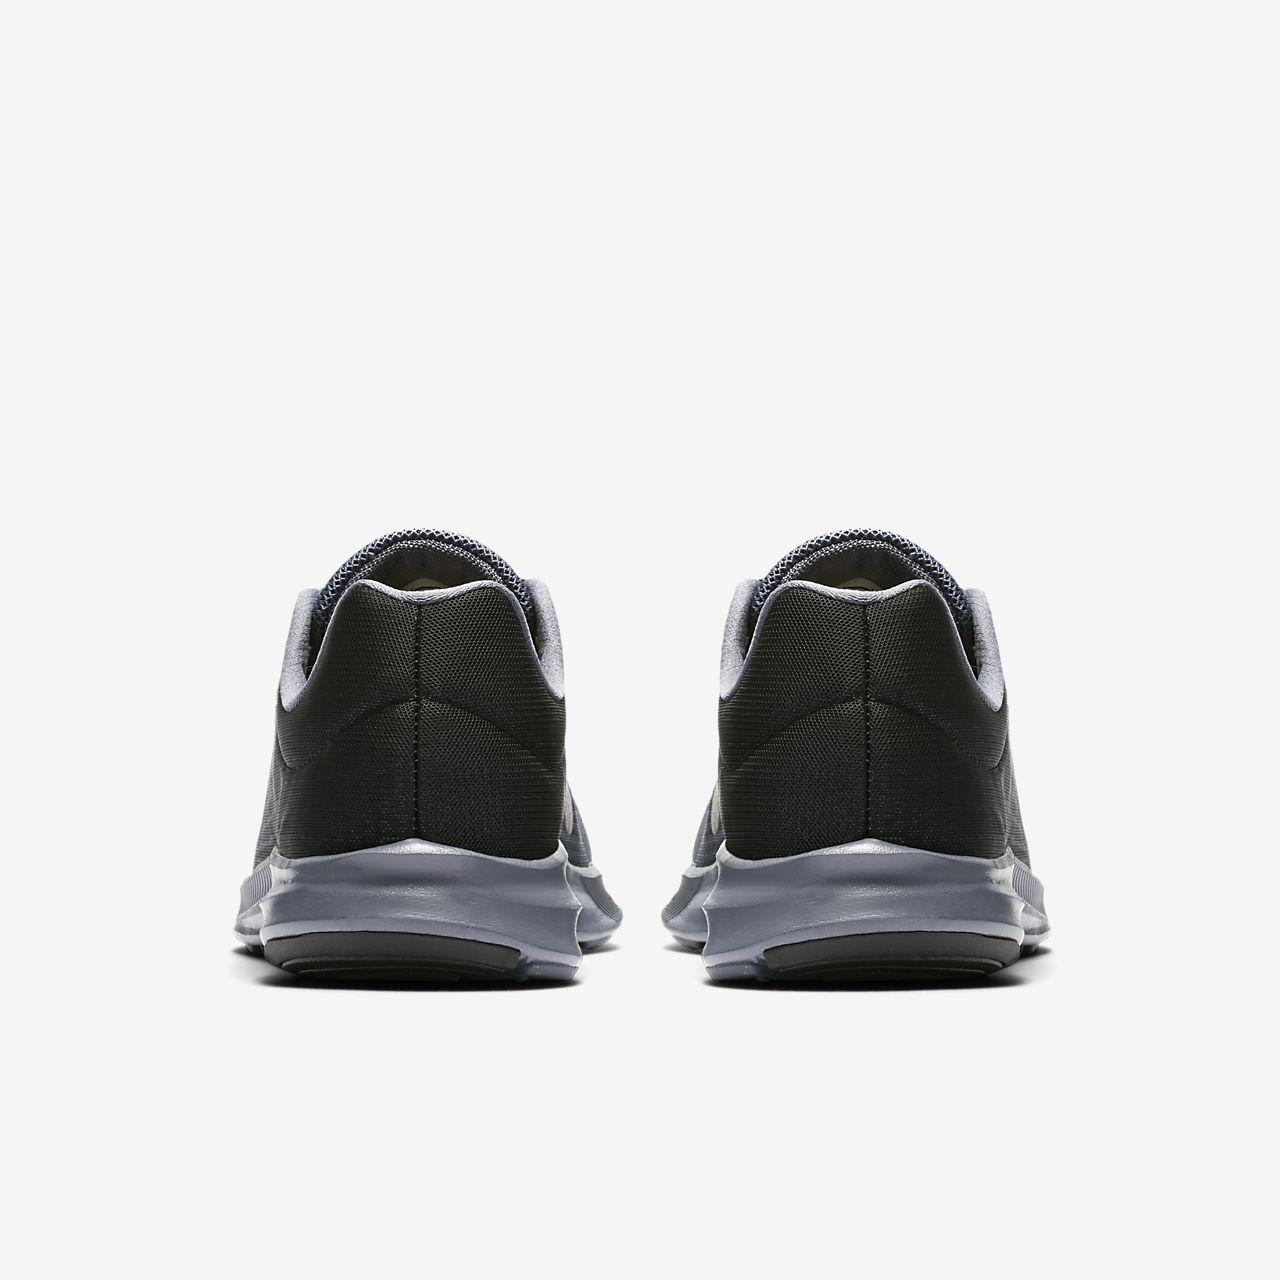 dff7465d05fc Nike Downshifter 8 Men s Running Shoe. Nike.com GB